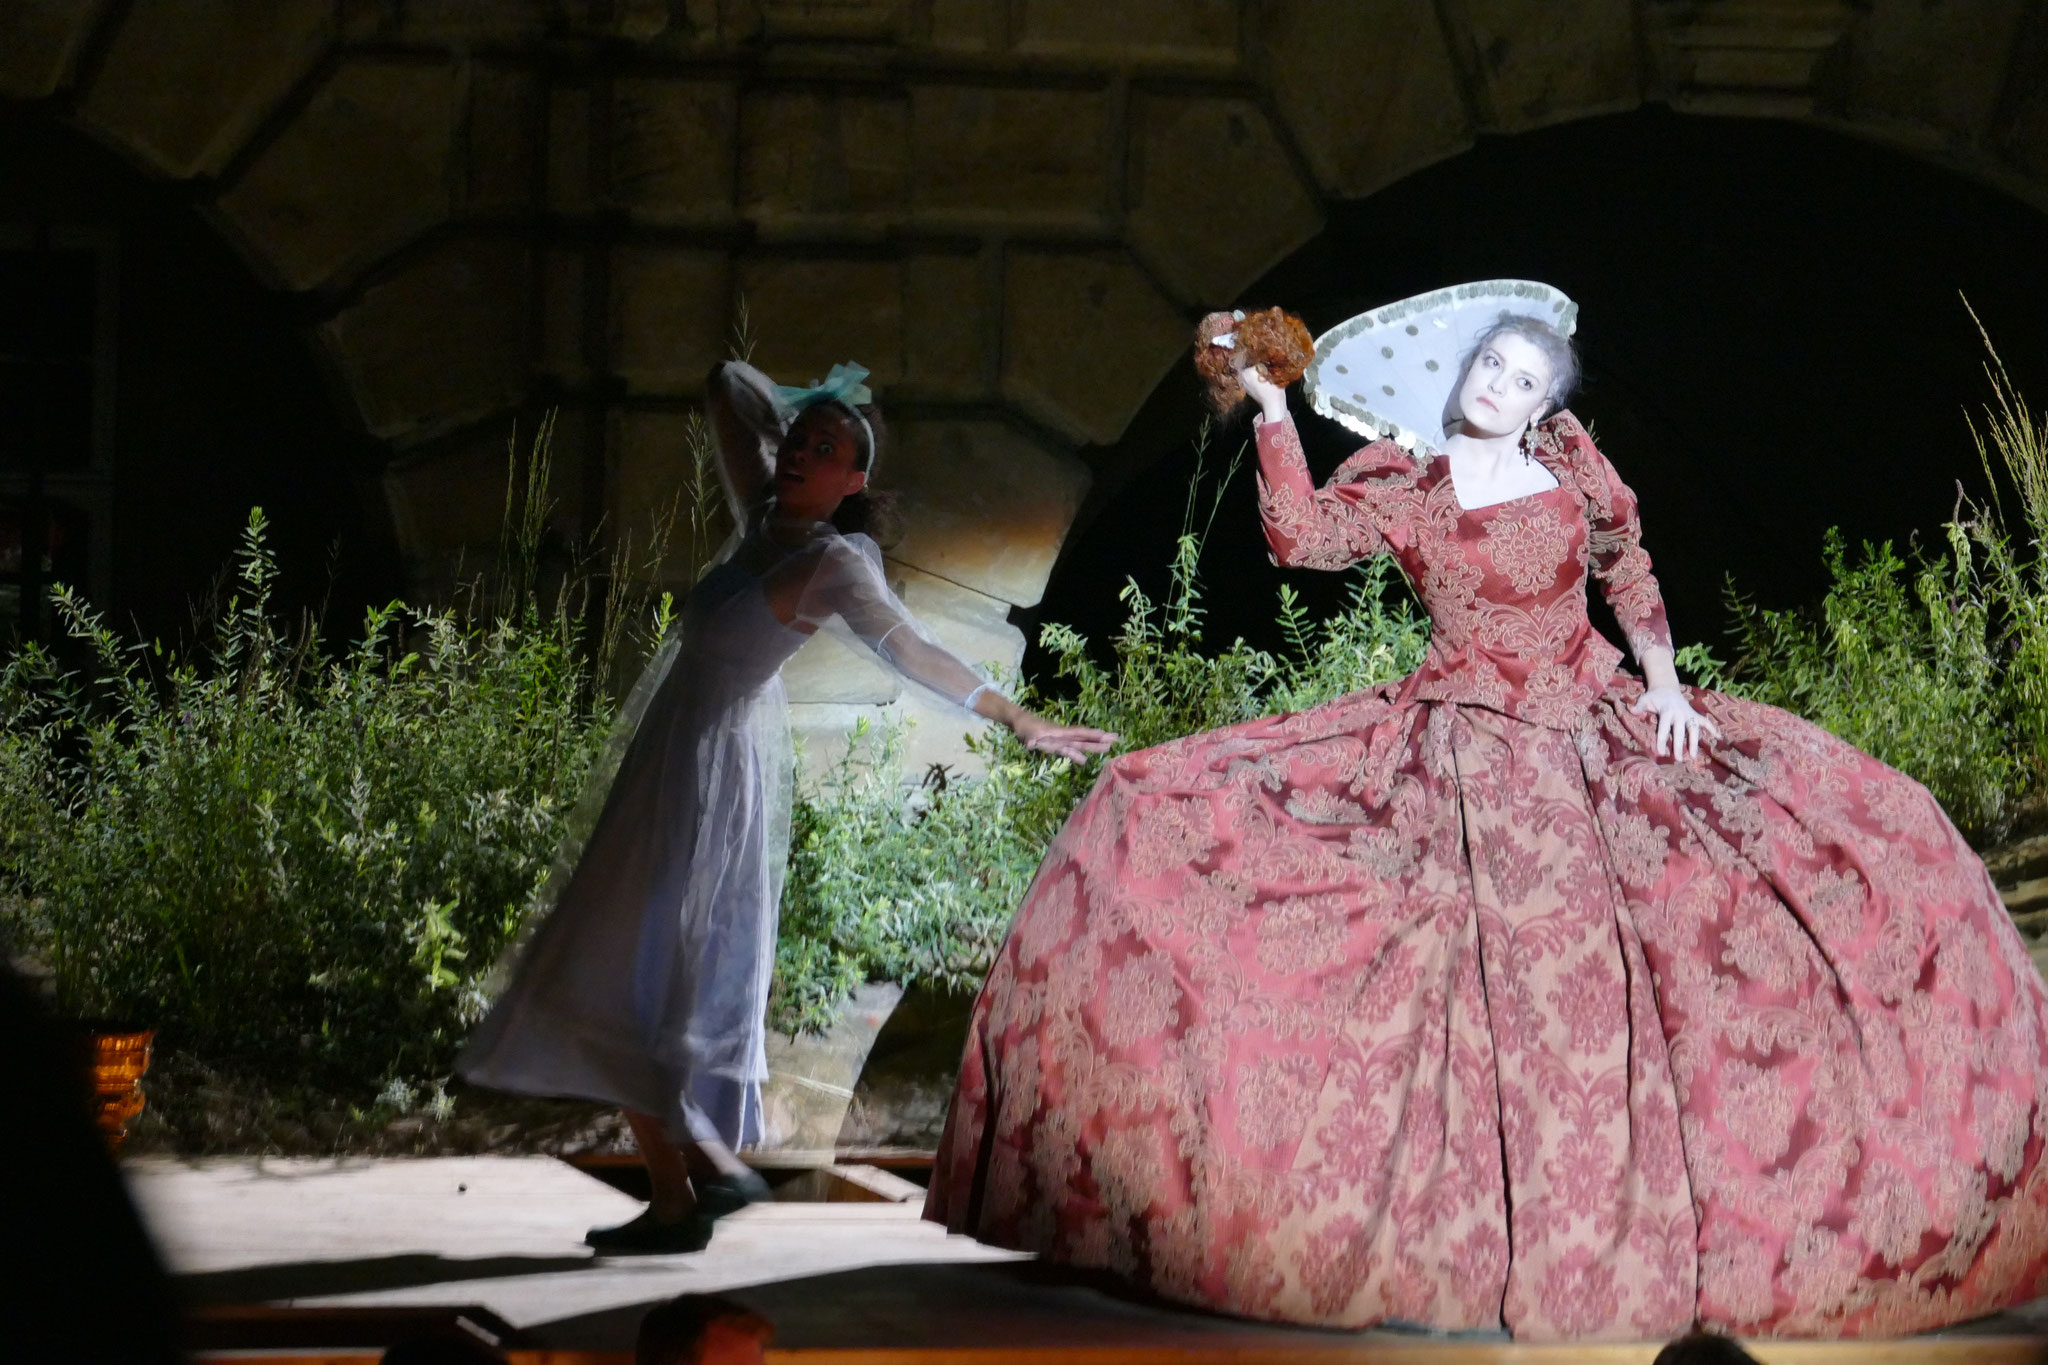 Knusperhexe/Hänsel und Gretel/Humperdinck - Junge Oper Schloss Weikersheim © Farina Grieb